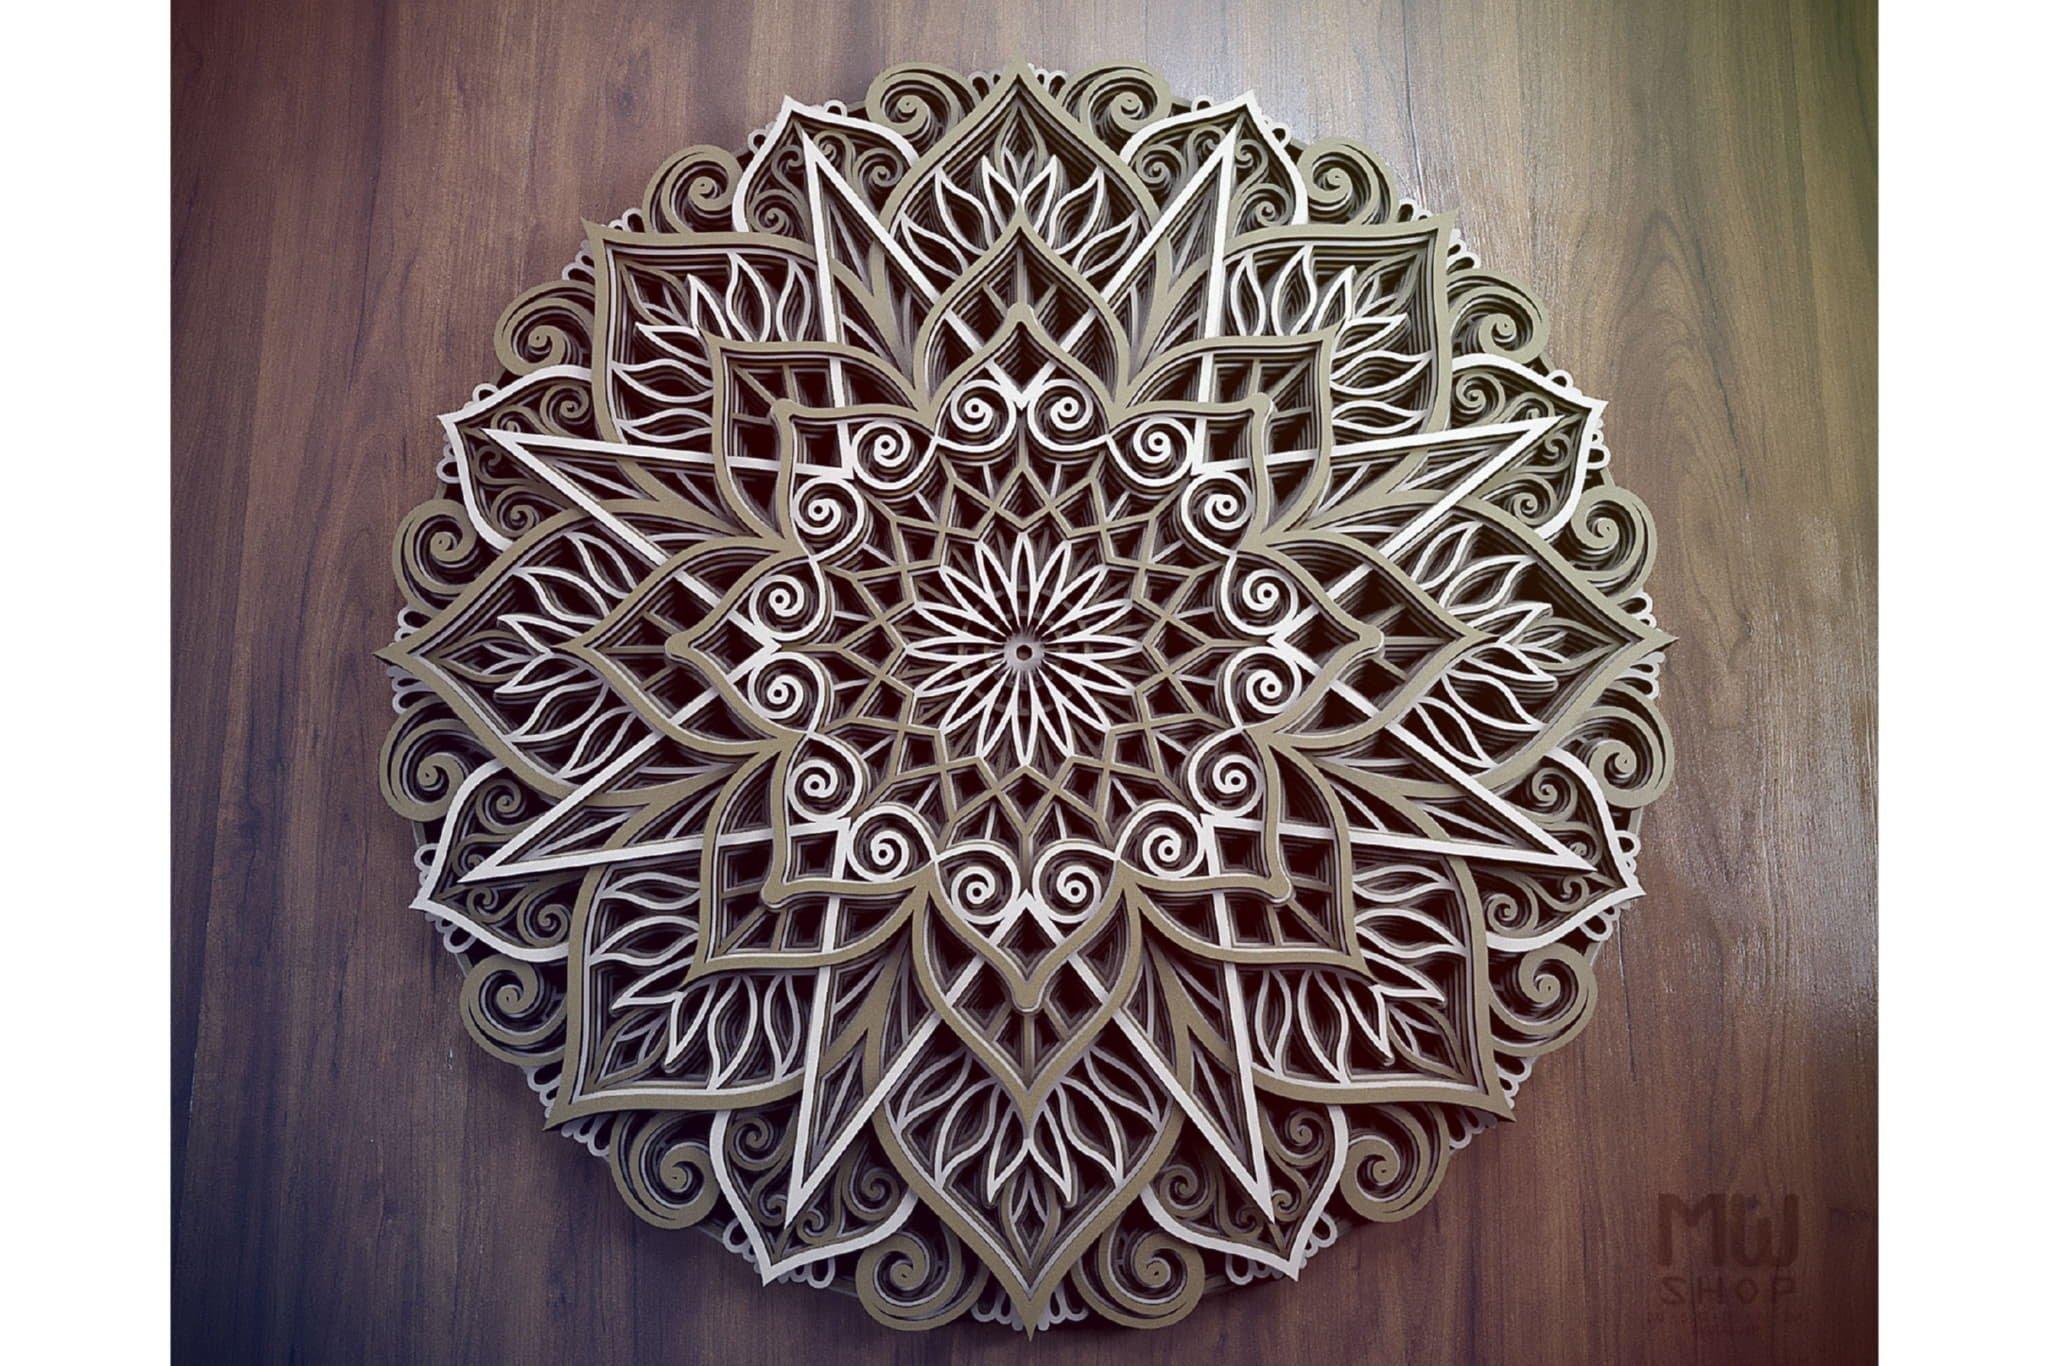 M89 - Mandala DXF Laser Cut Pattern, Flower mandala pattern example image 9